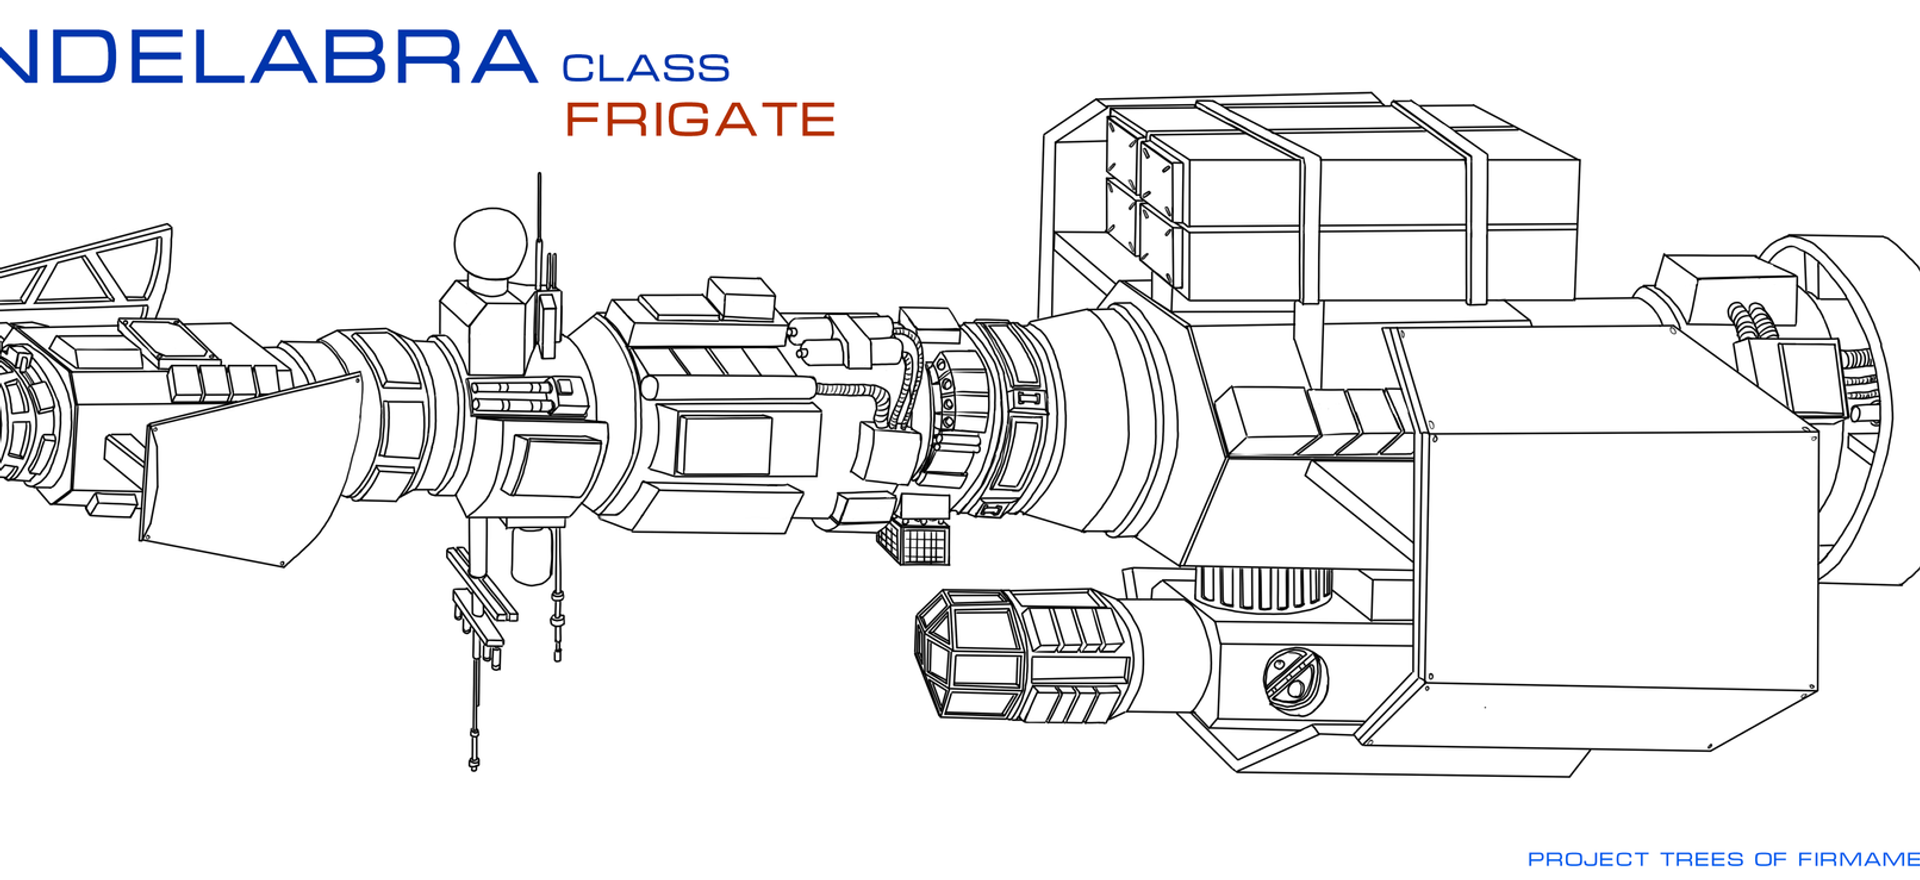 Spaceship design - Candelabra Class Frigate - Tree of Firmament